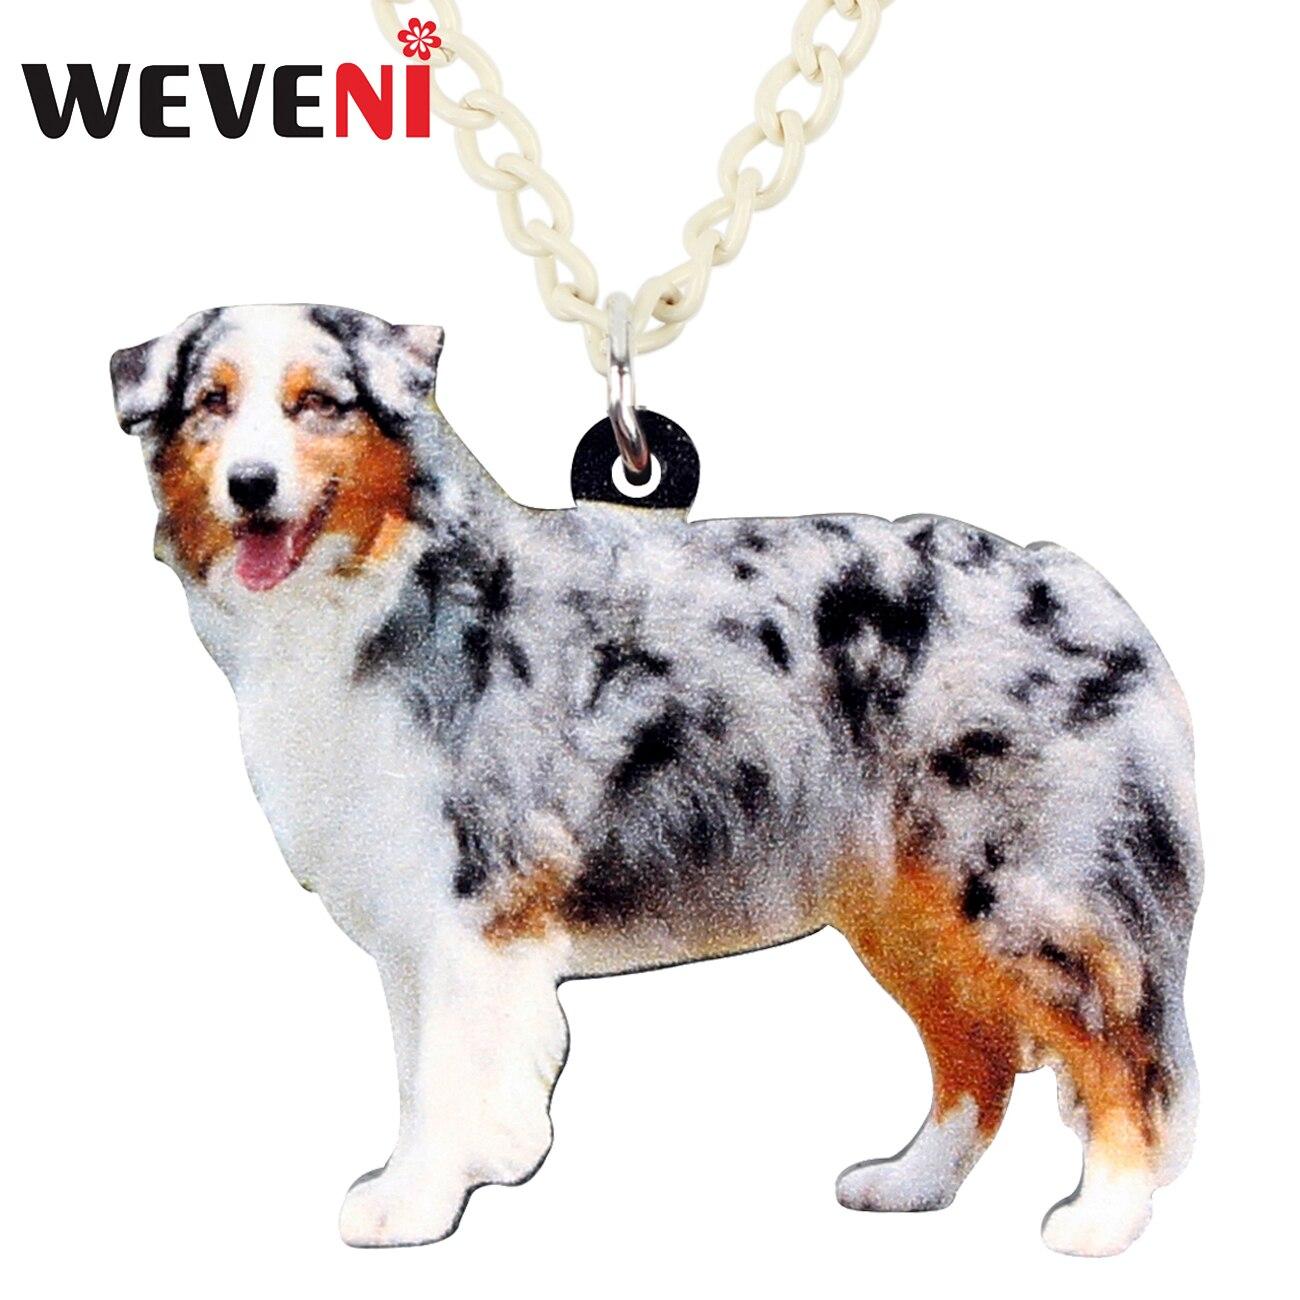 WEVENI Acrylic Happy Australian Shepherd Dog Necklace Pendant Anime Animal Pets Jewelry For Women Girls Gift Dropshipping Bijoux